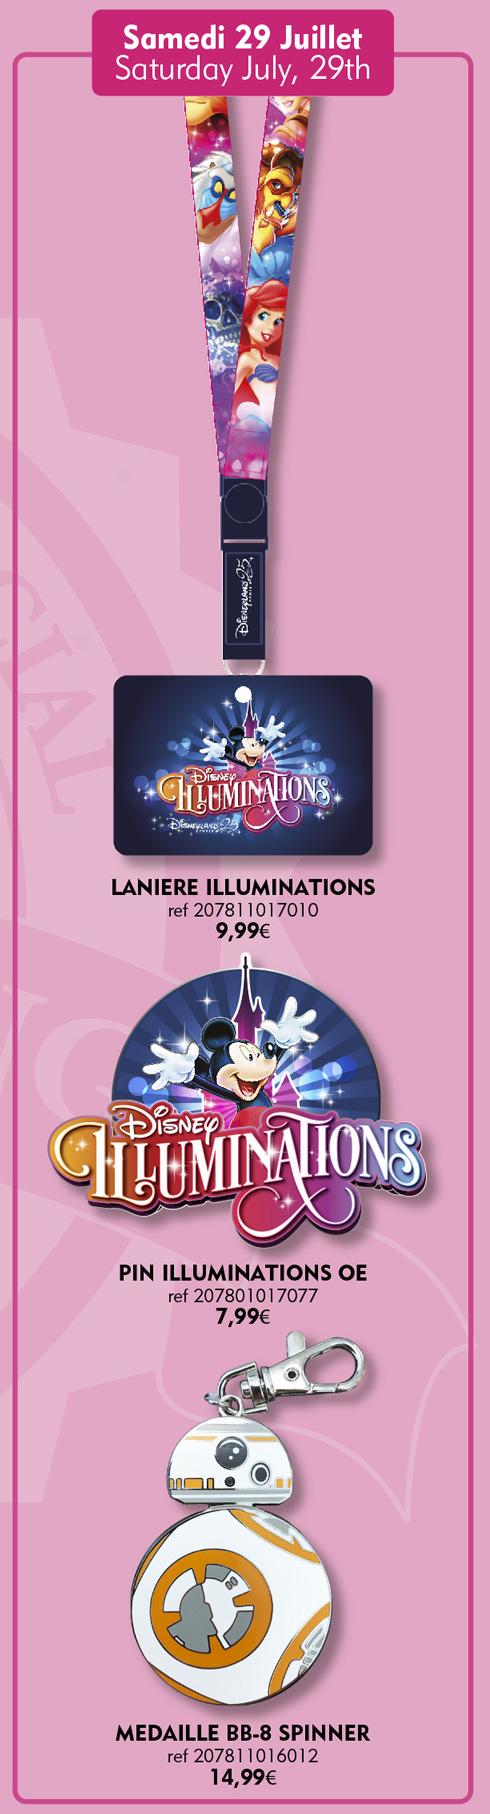 Disneyland Paris Pins For July 29th 2017